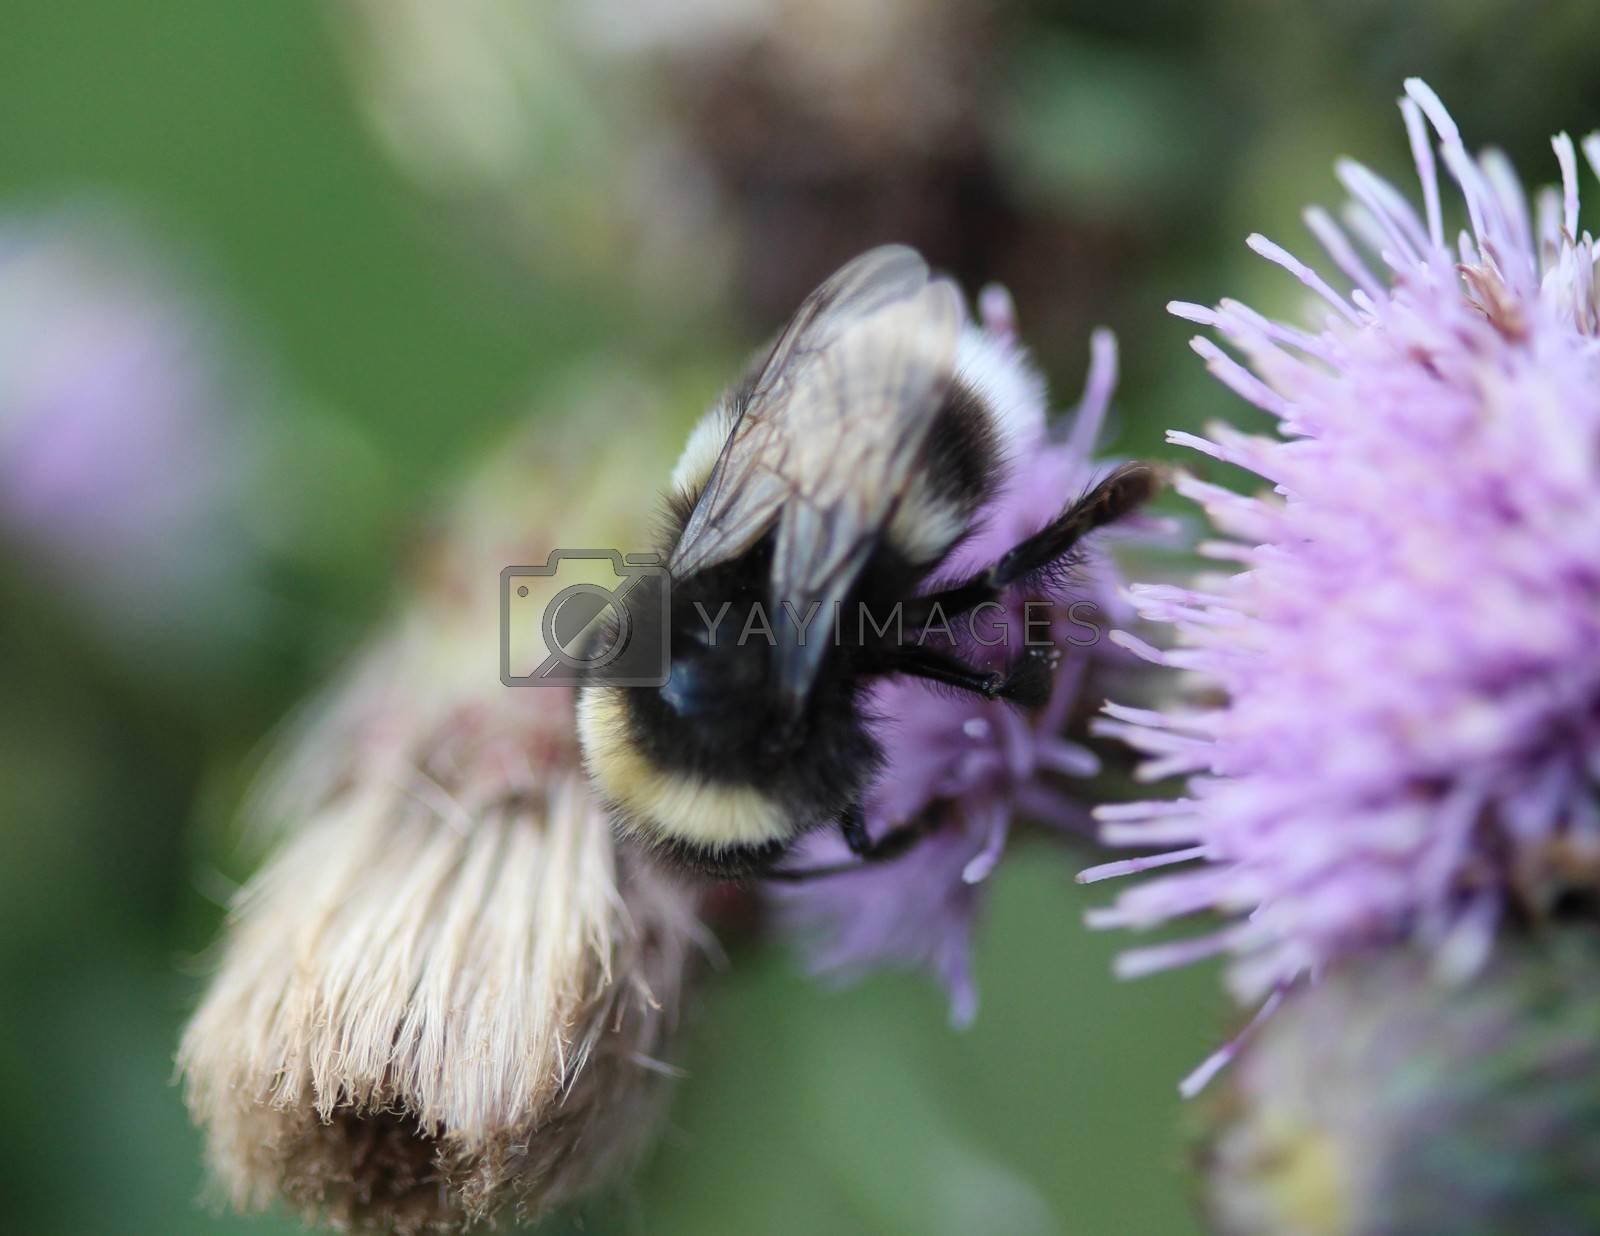 Royalty free image of heath humble-bee or small heath bumblebee, Bombus jonellus by michaelmeijer